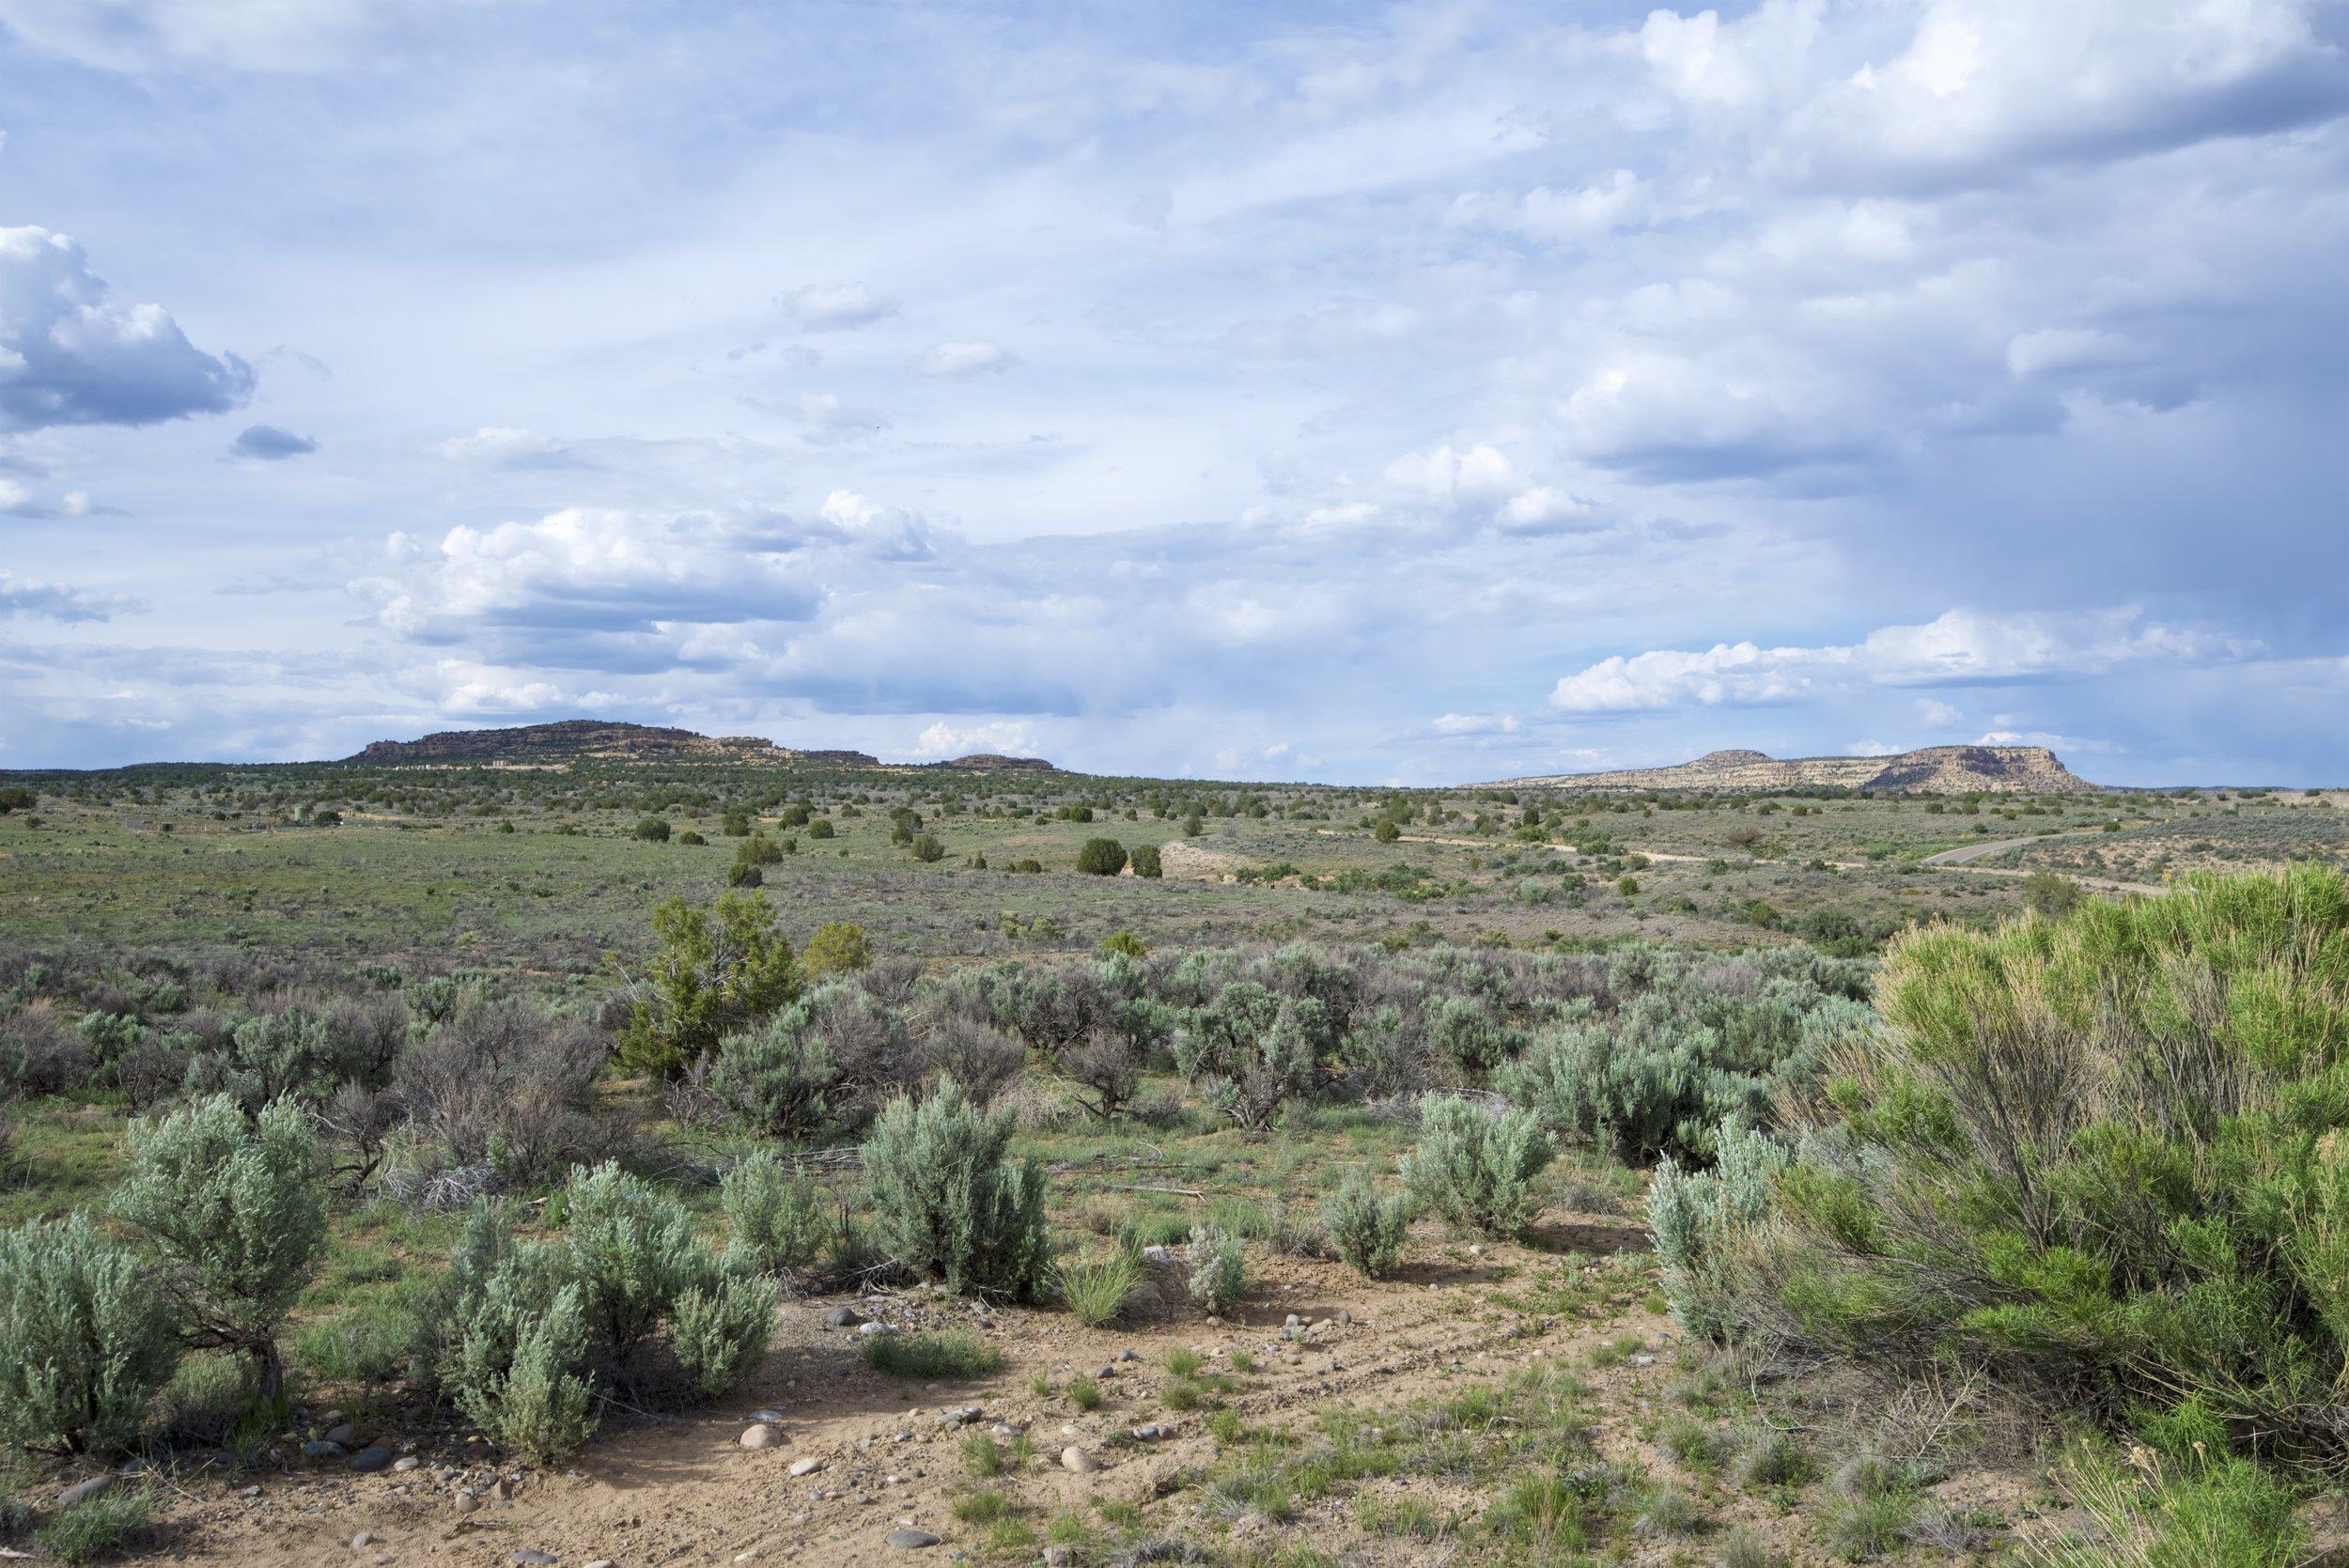 SJNM-4393-navajo-dam-127998.jpg